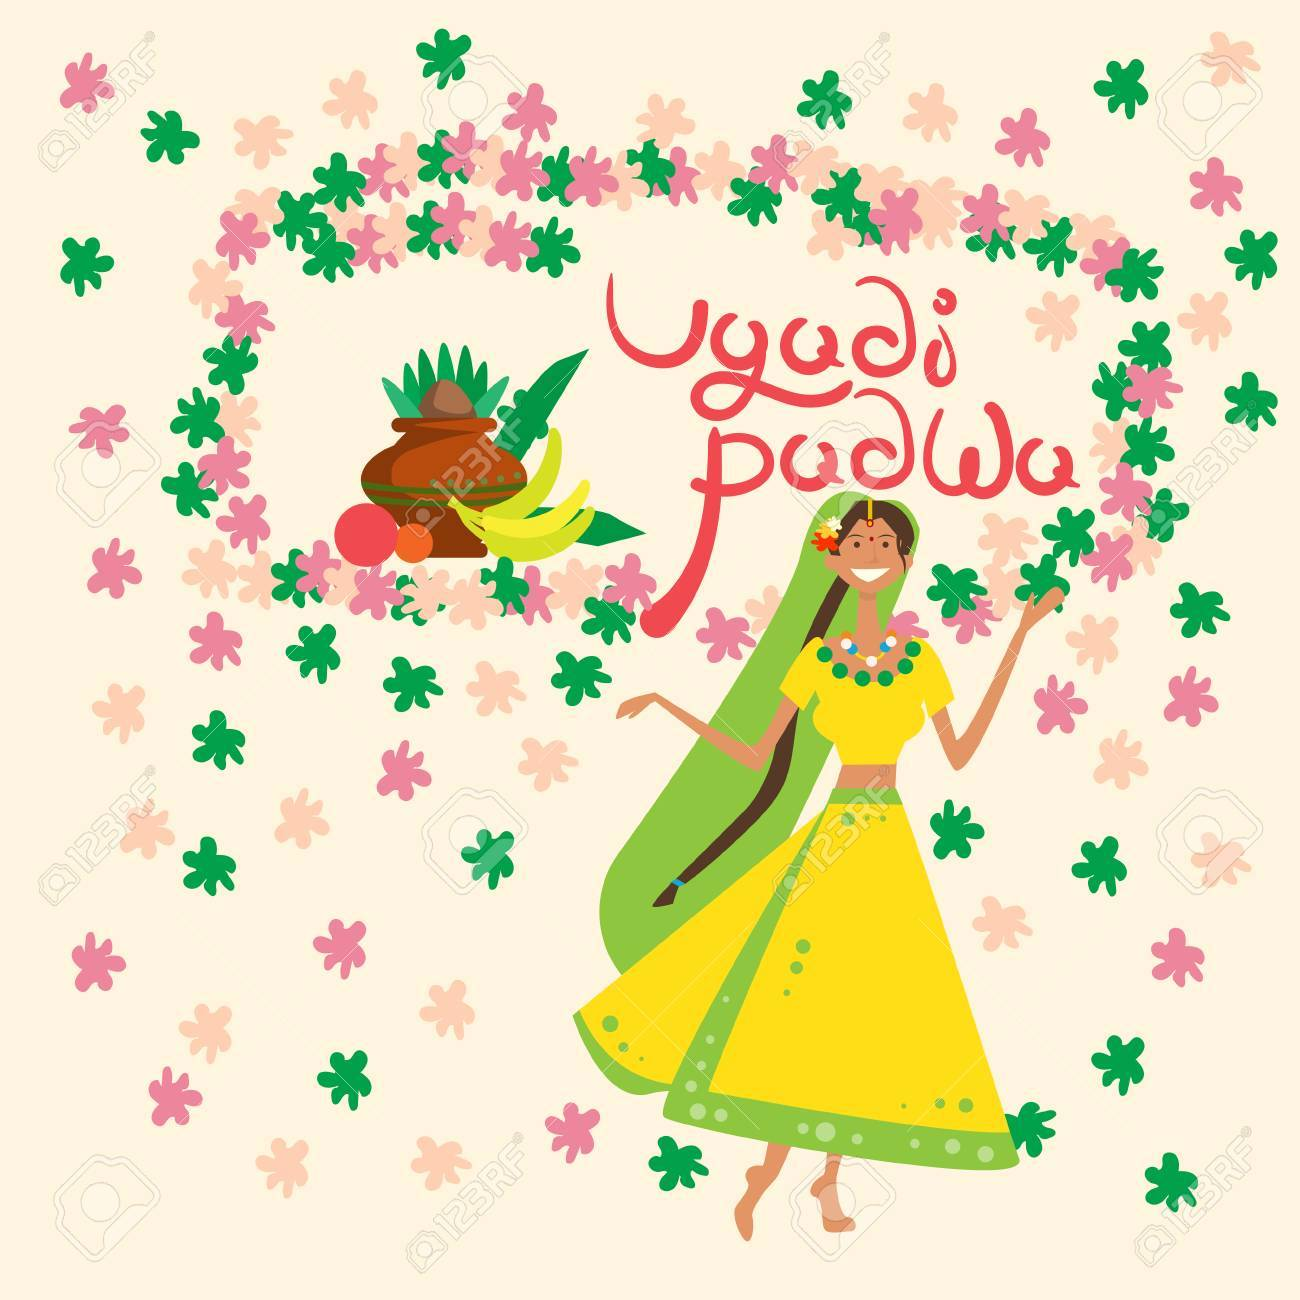 Woman Celebrating Happy Ugadi And Gudi Padwa Hindu New Year Greeting